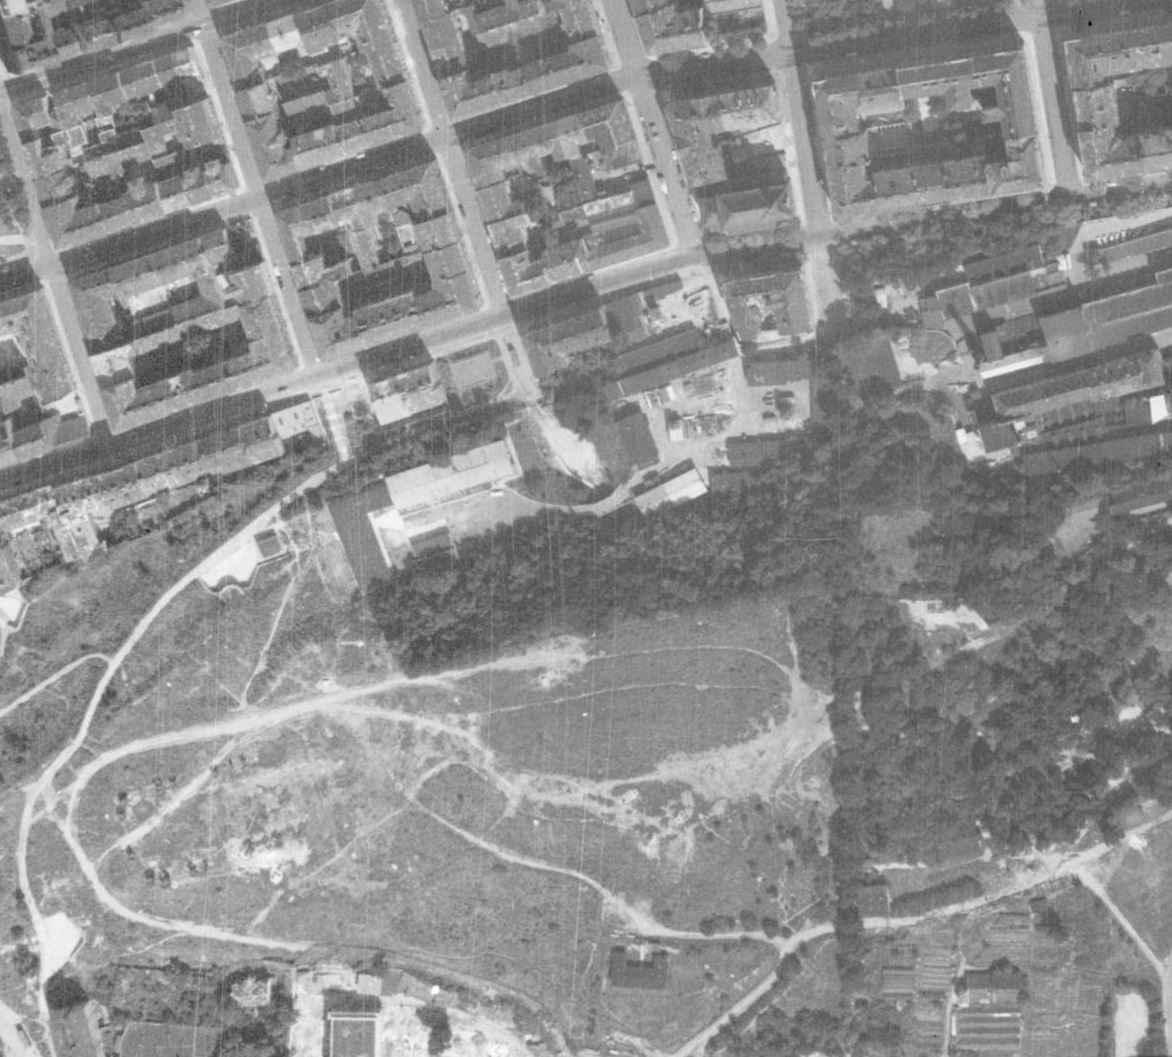 nouzova-kolonie-u-kapslovny-letecky-snimek-1966